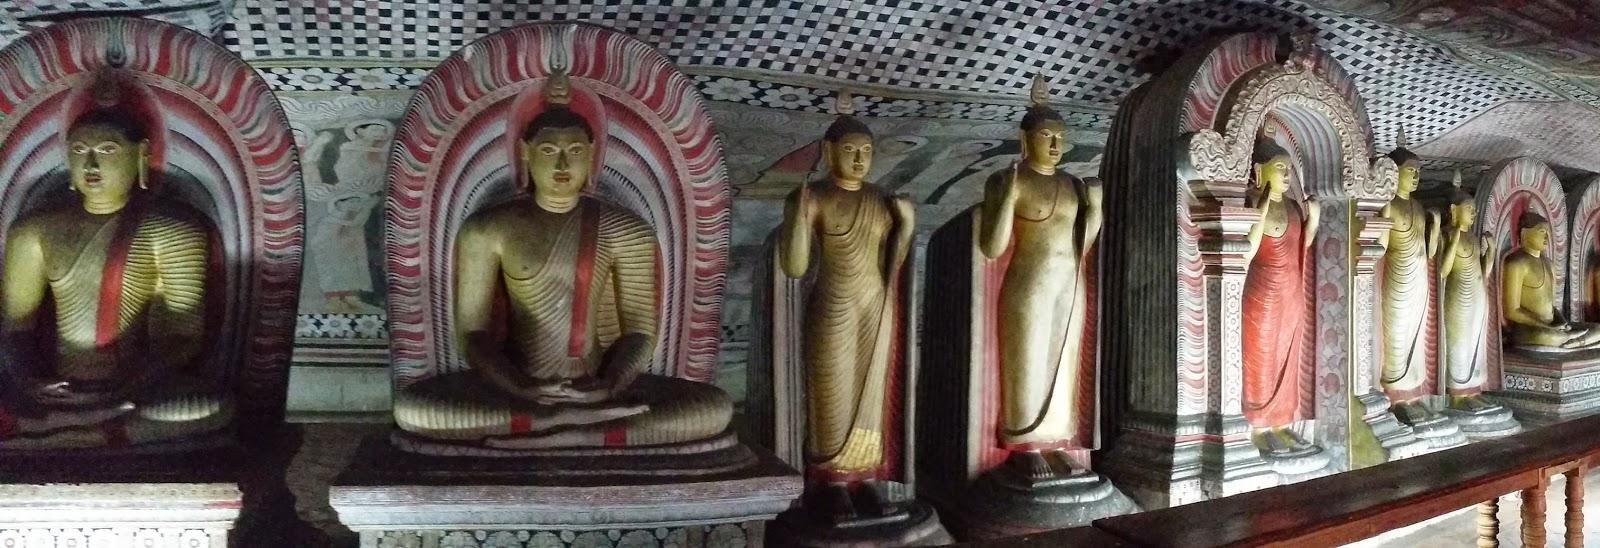 Interior de las Cuevas de Dambulla (Sri Lanka)